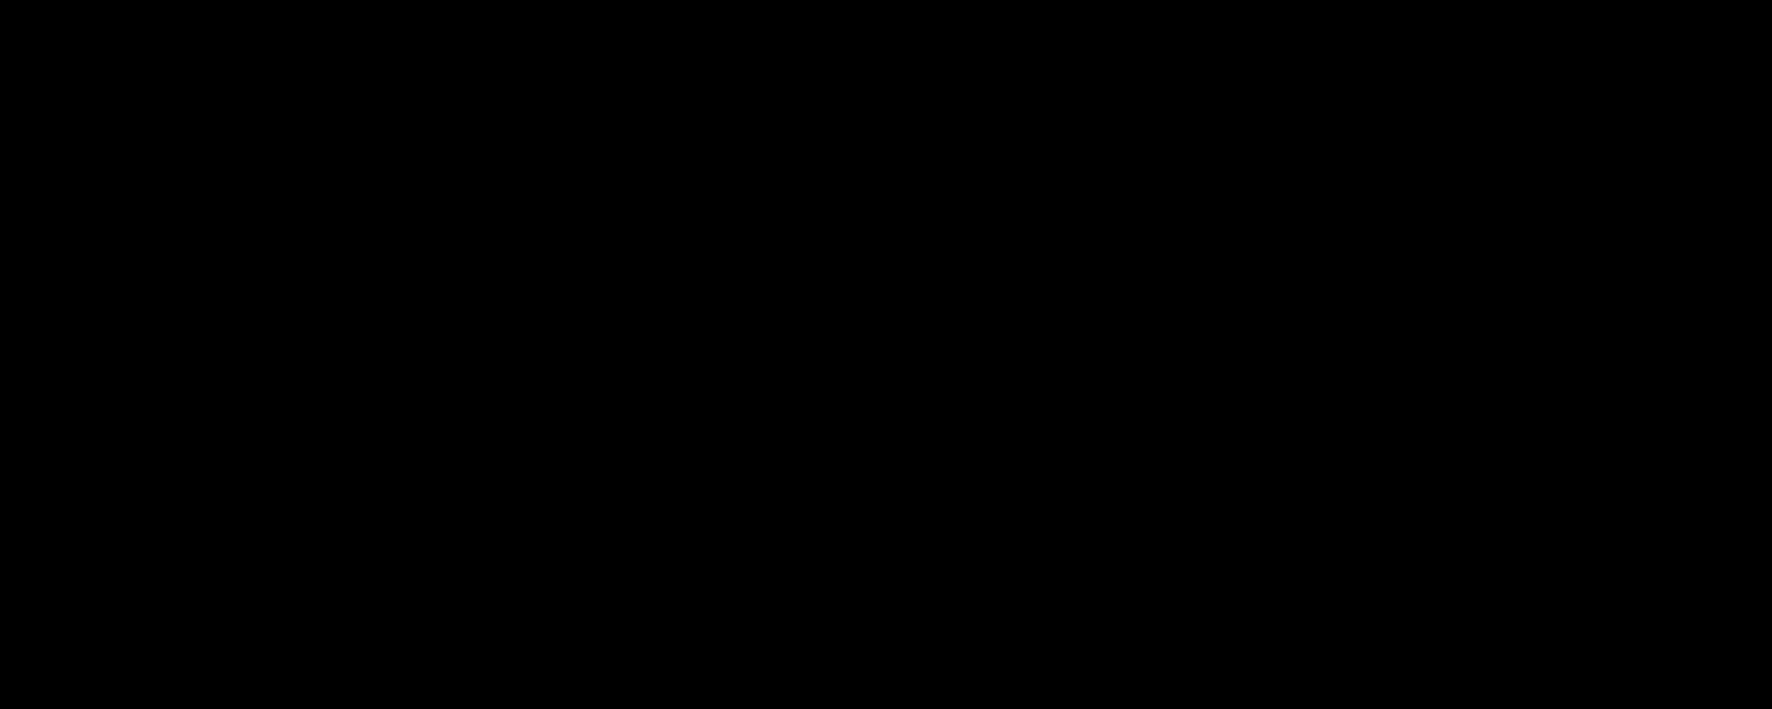 CASTELO カステロ 沖縄セレクトショップ 那覇市安里